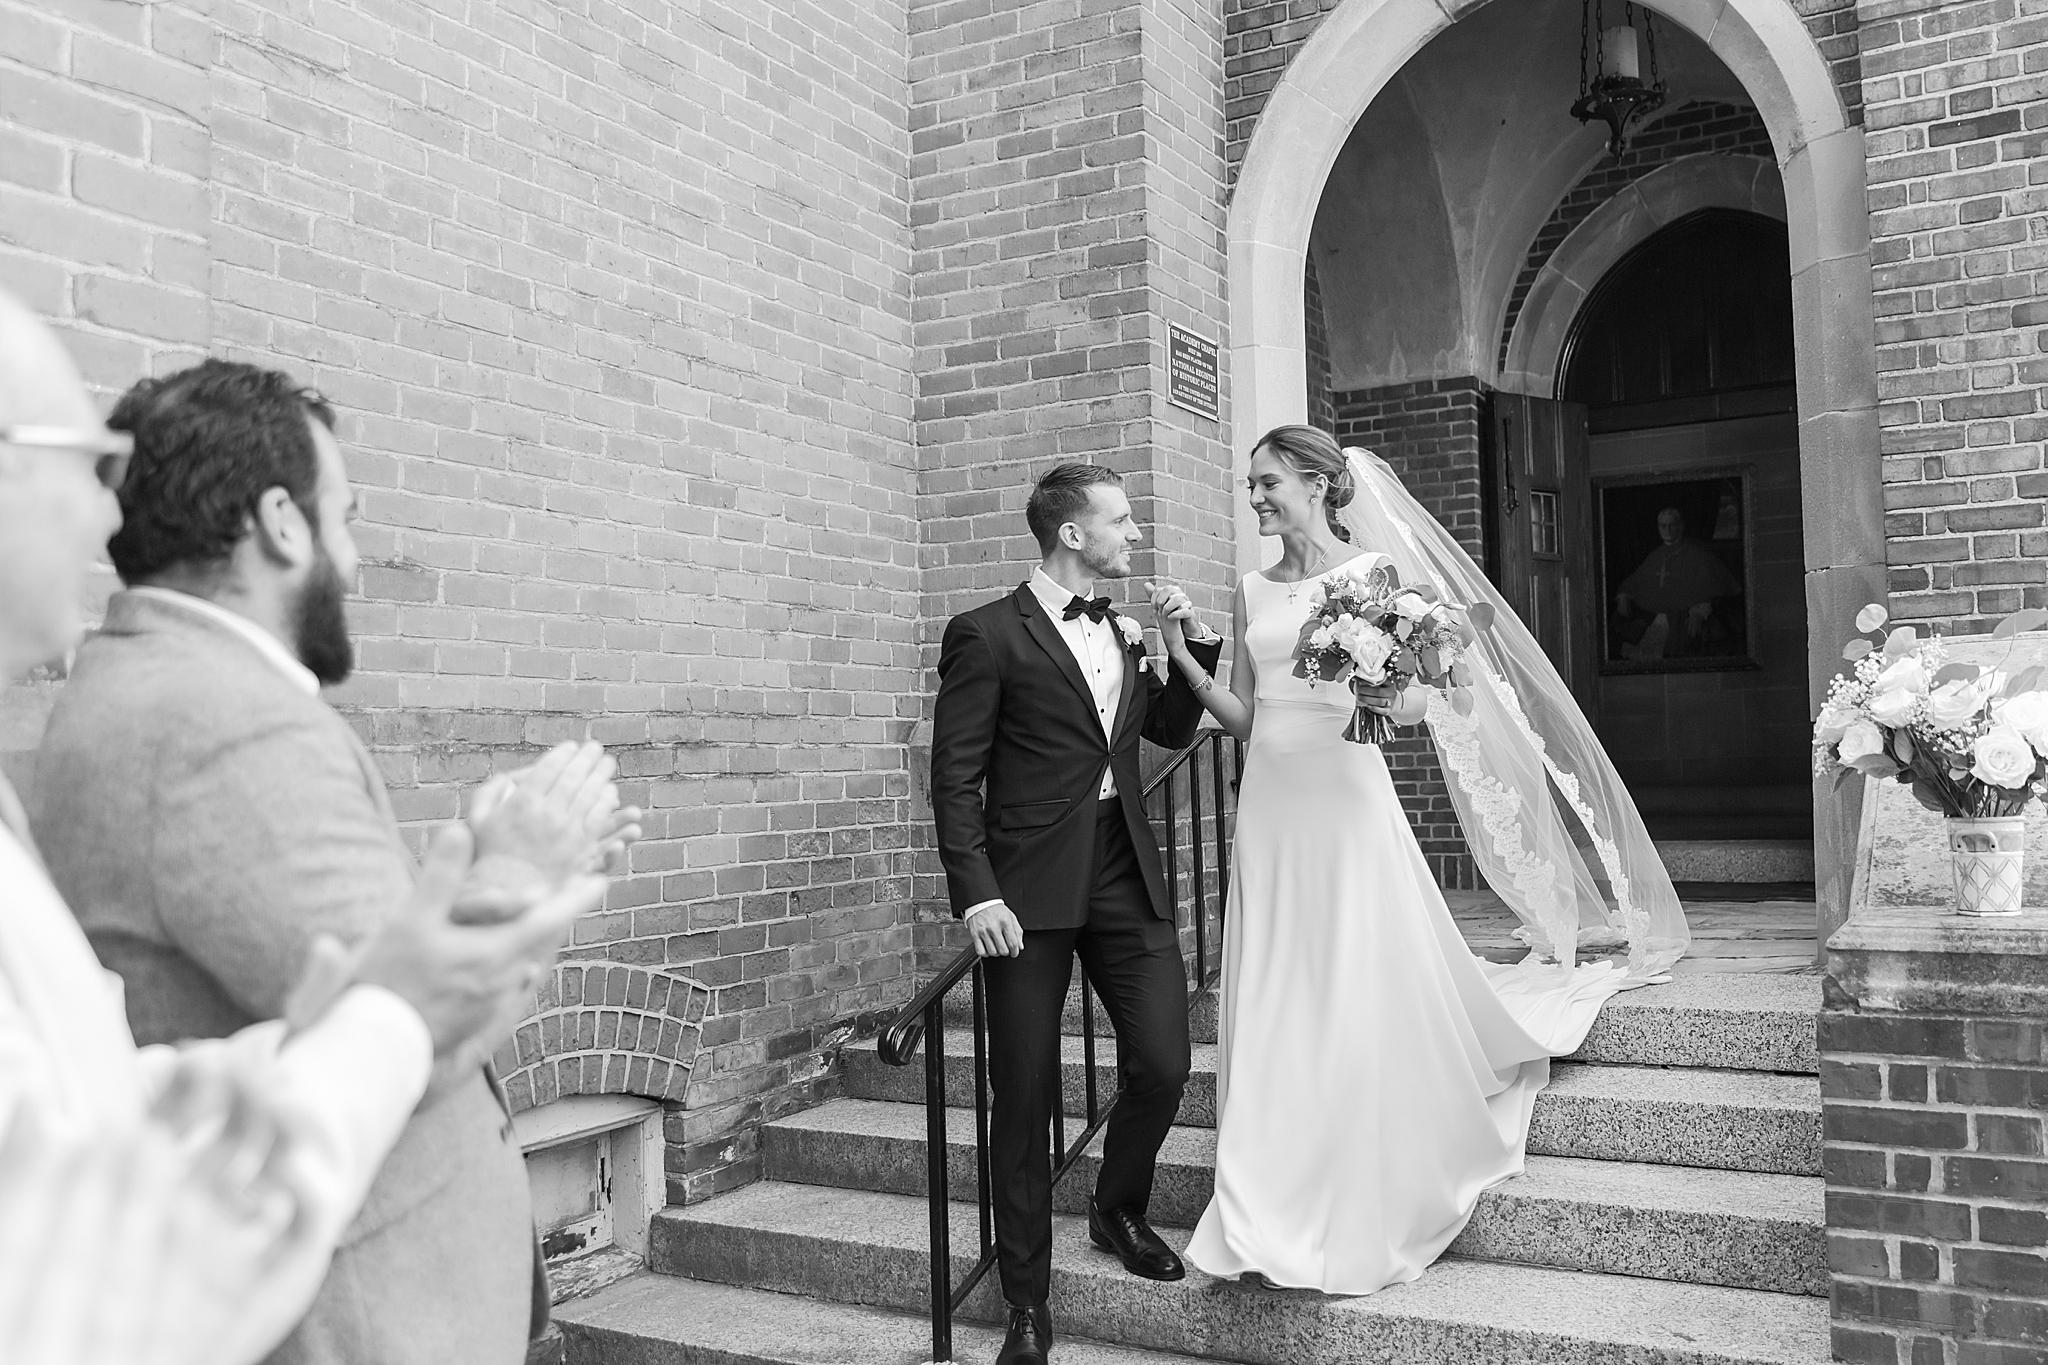 detroit-wedding-photographer-grosse-pointe-academy-chapel-detroit-golf-club-wedding-carly-matt-by-courtney-carolyn-photography_0056.jpg